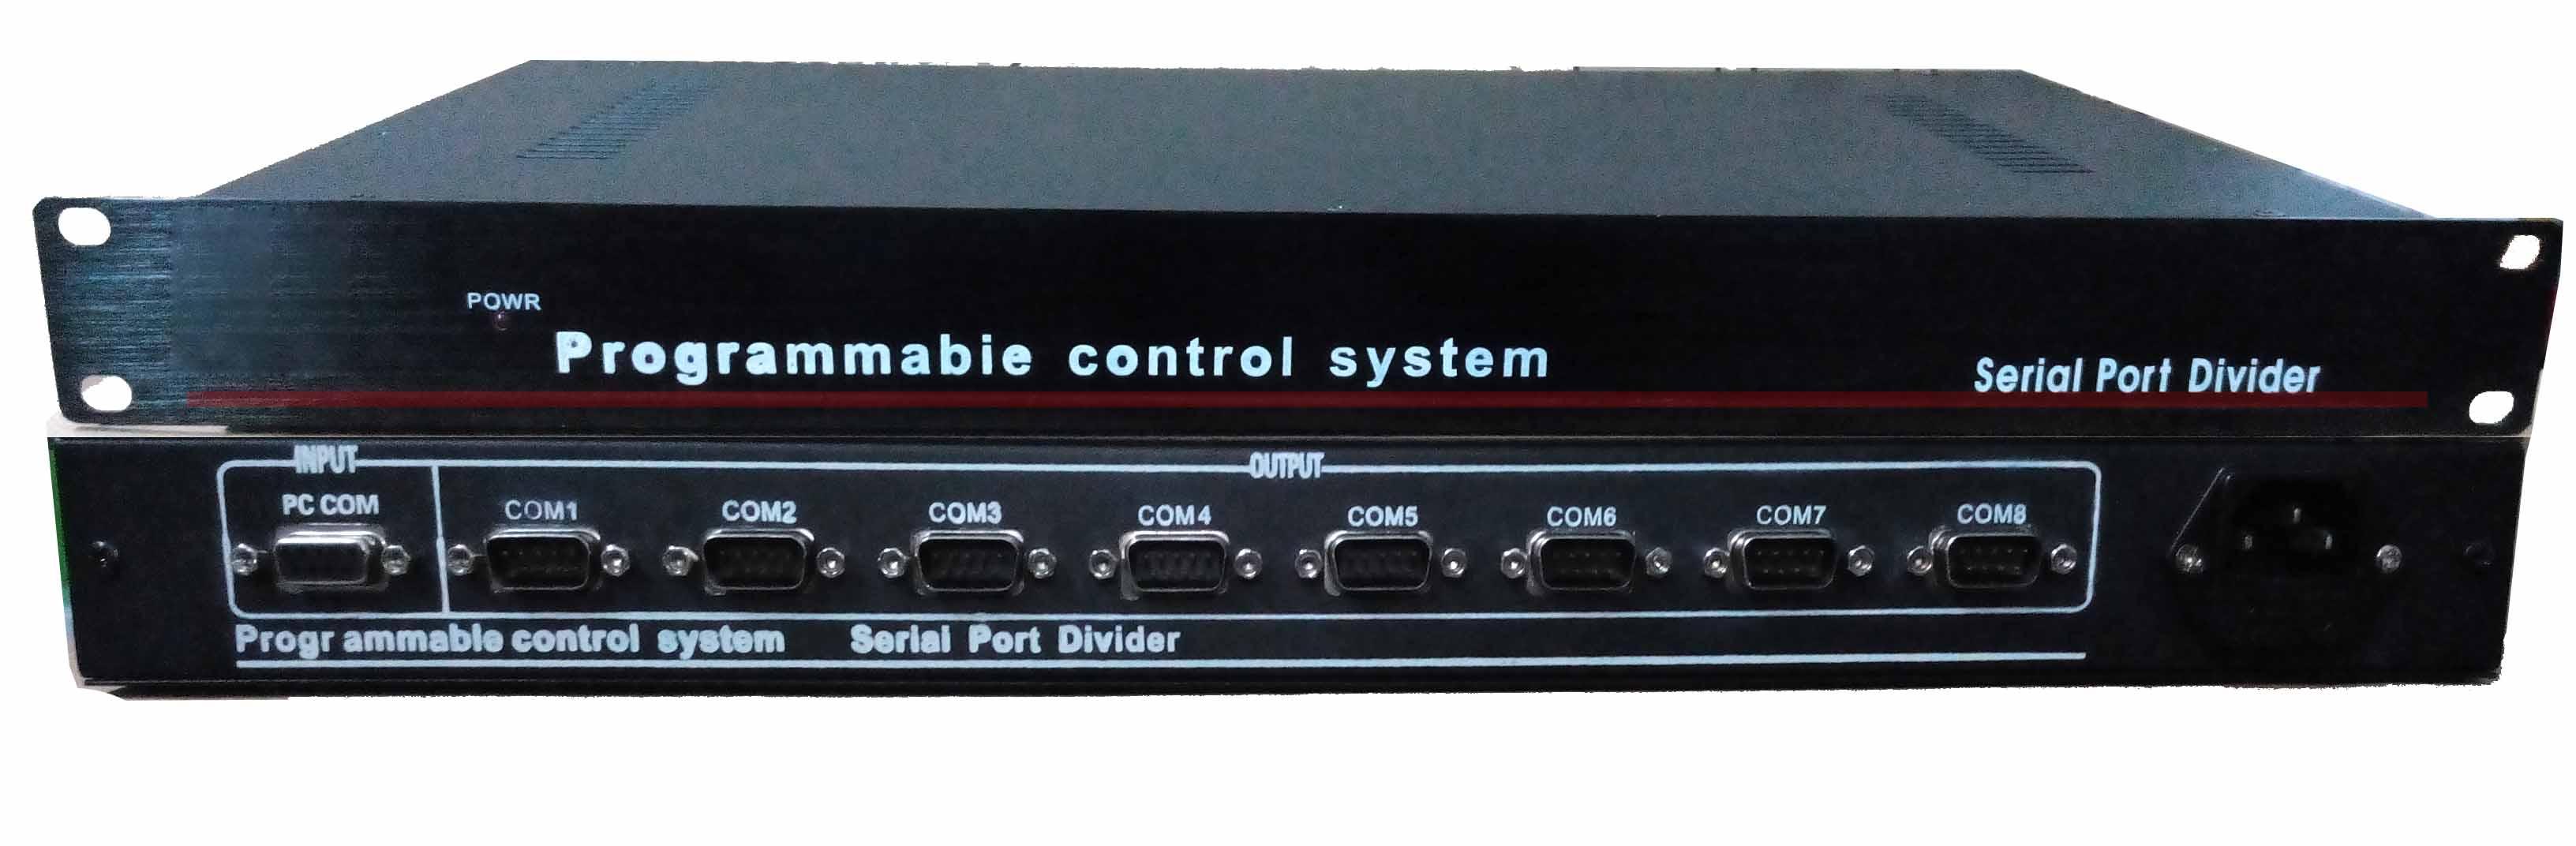 На контроле расширять устройство RS232 расширять устройство 8 дорога строка рот расширять устройство COM рот расширять устройство строка рот служба устройство